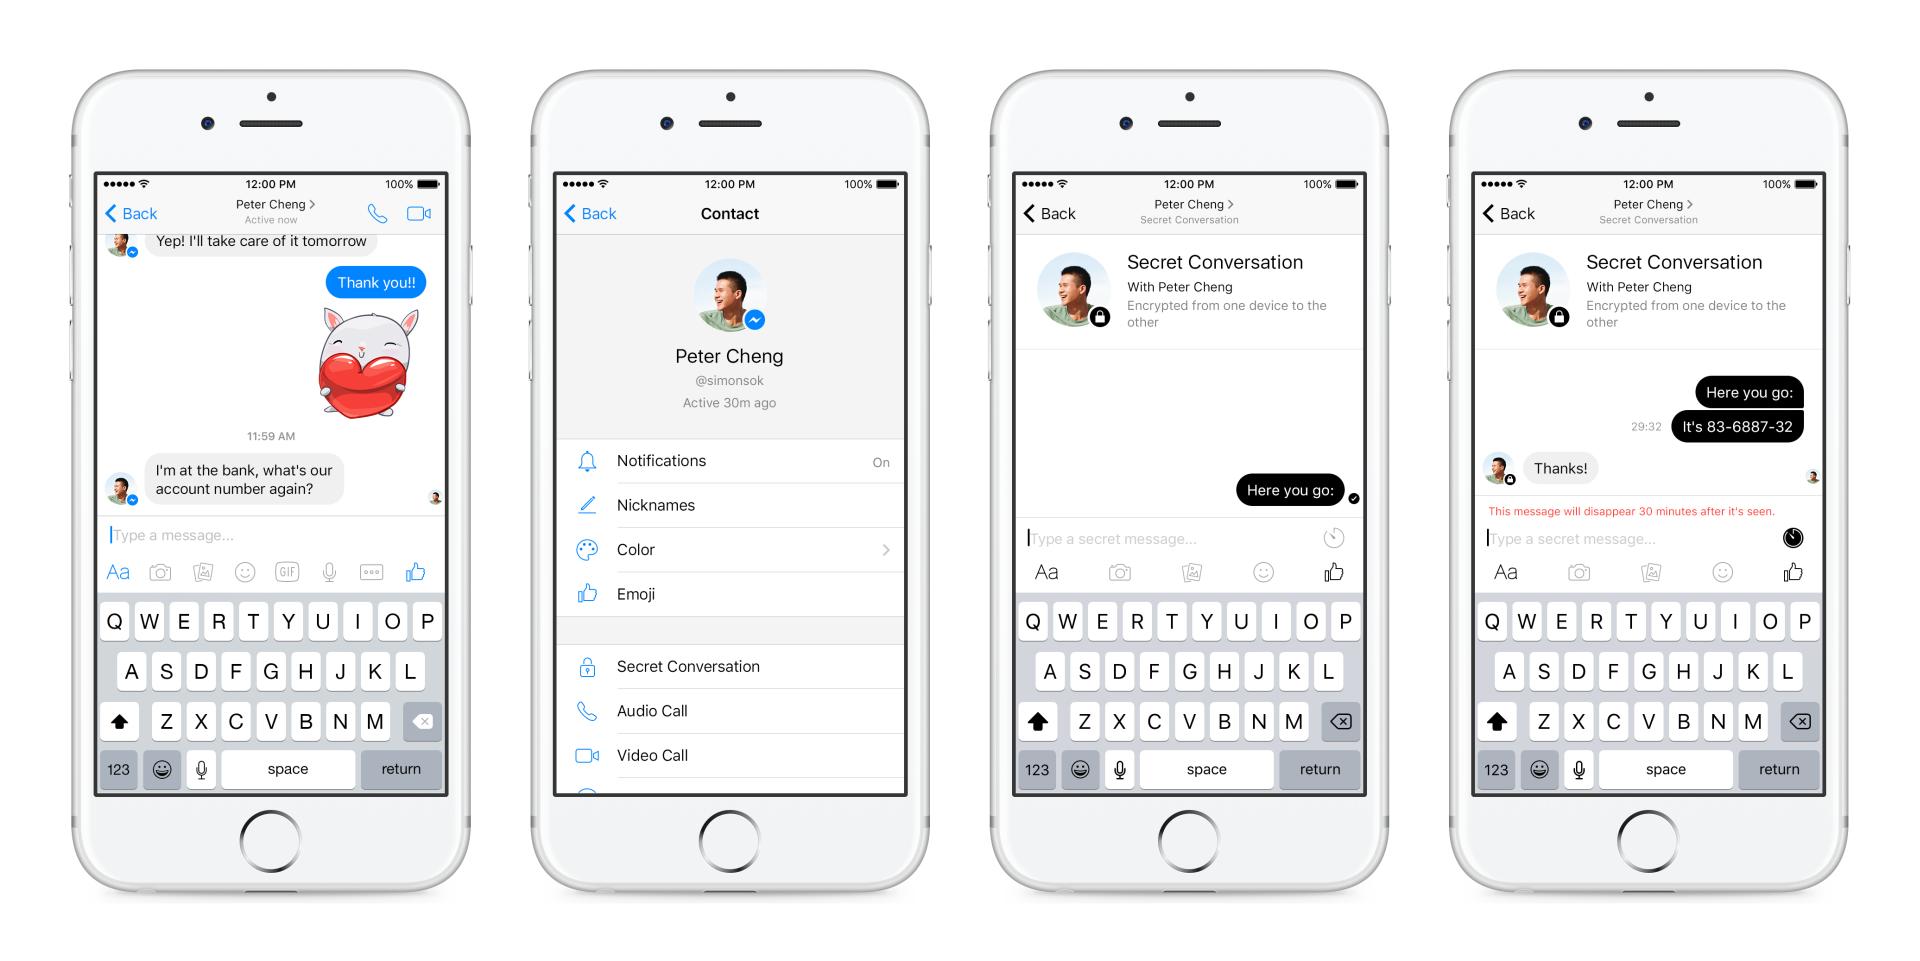 Facebook Messenger начал тестировать end-to-end шифрование на протоколе Signal - 1